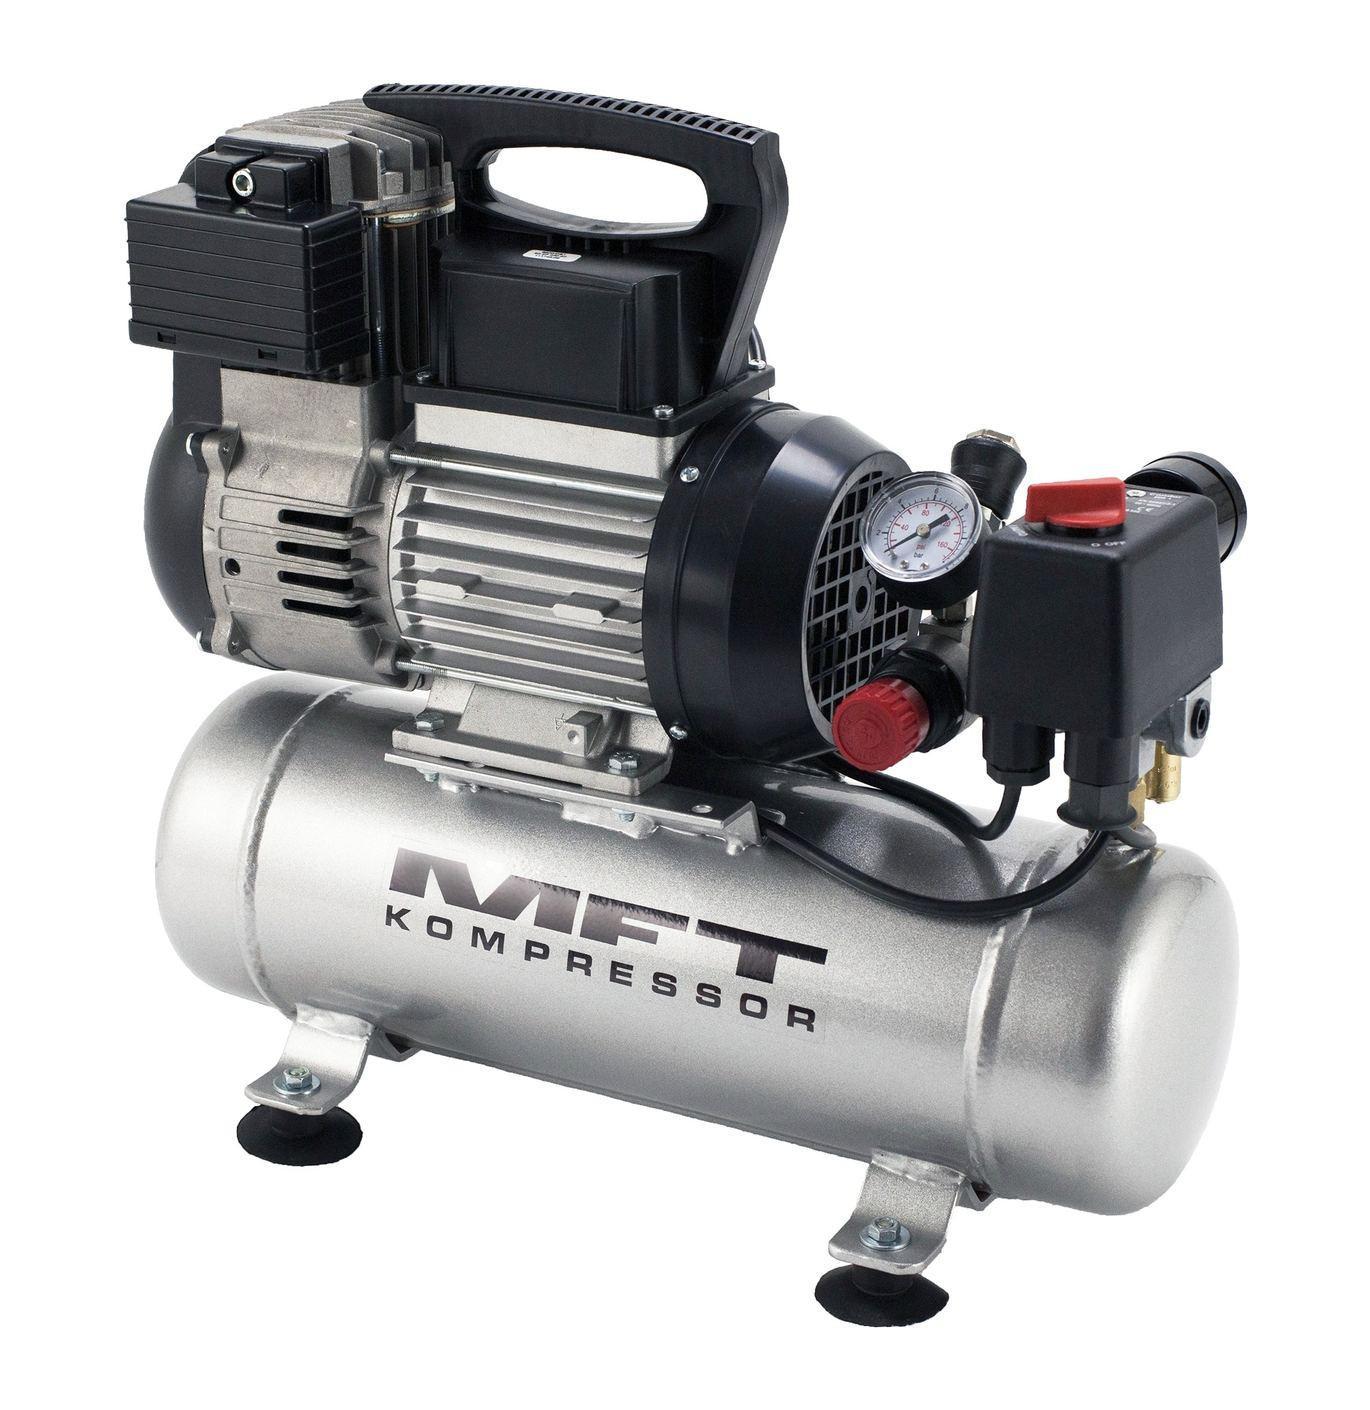 Kompressor 70l / min MFT105 220v